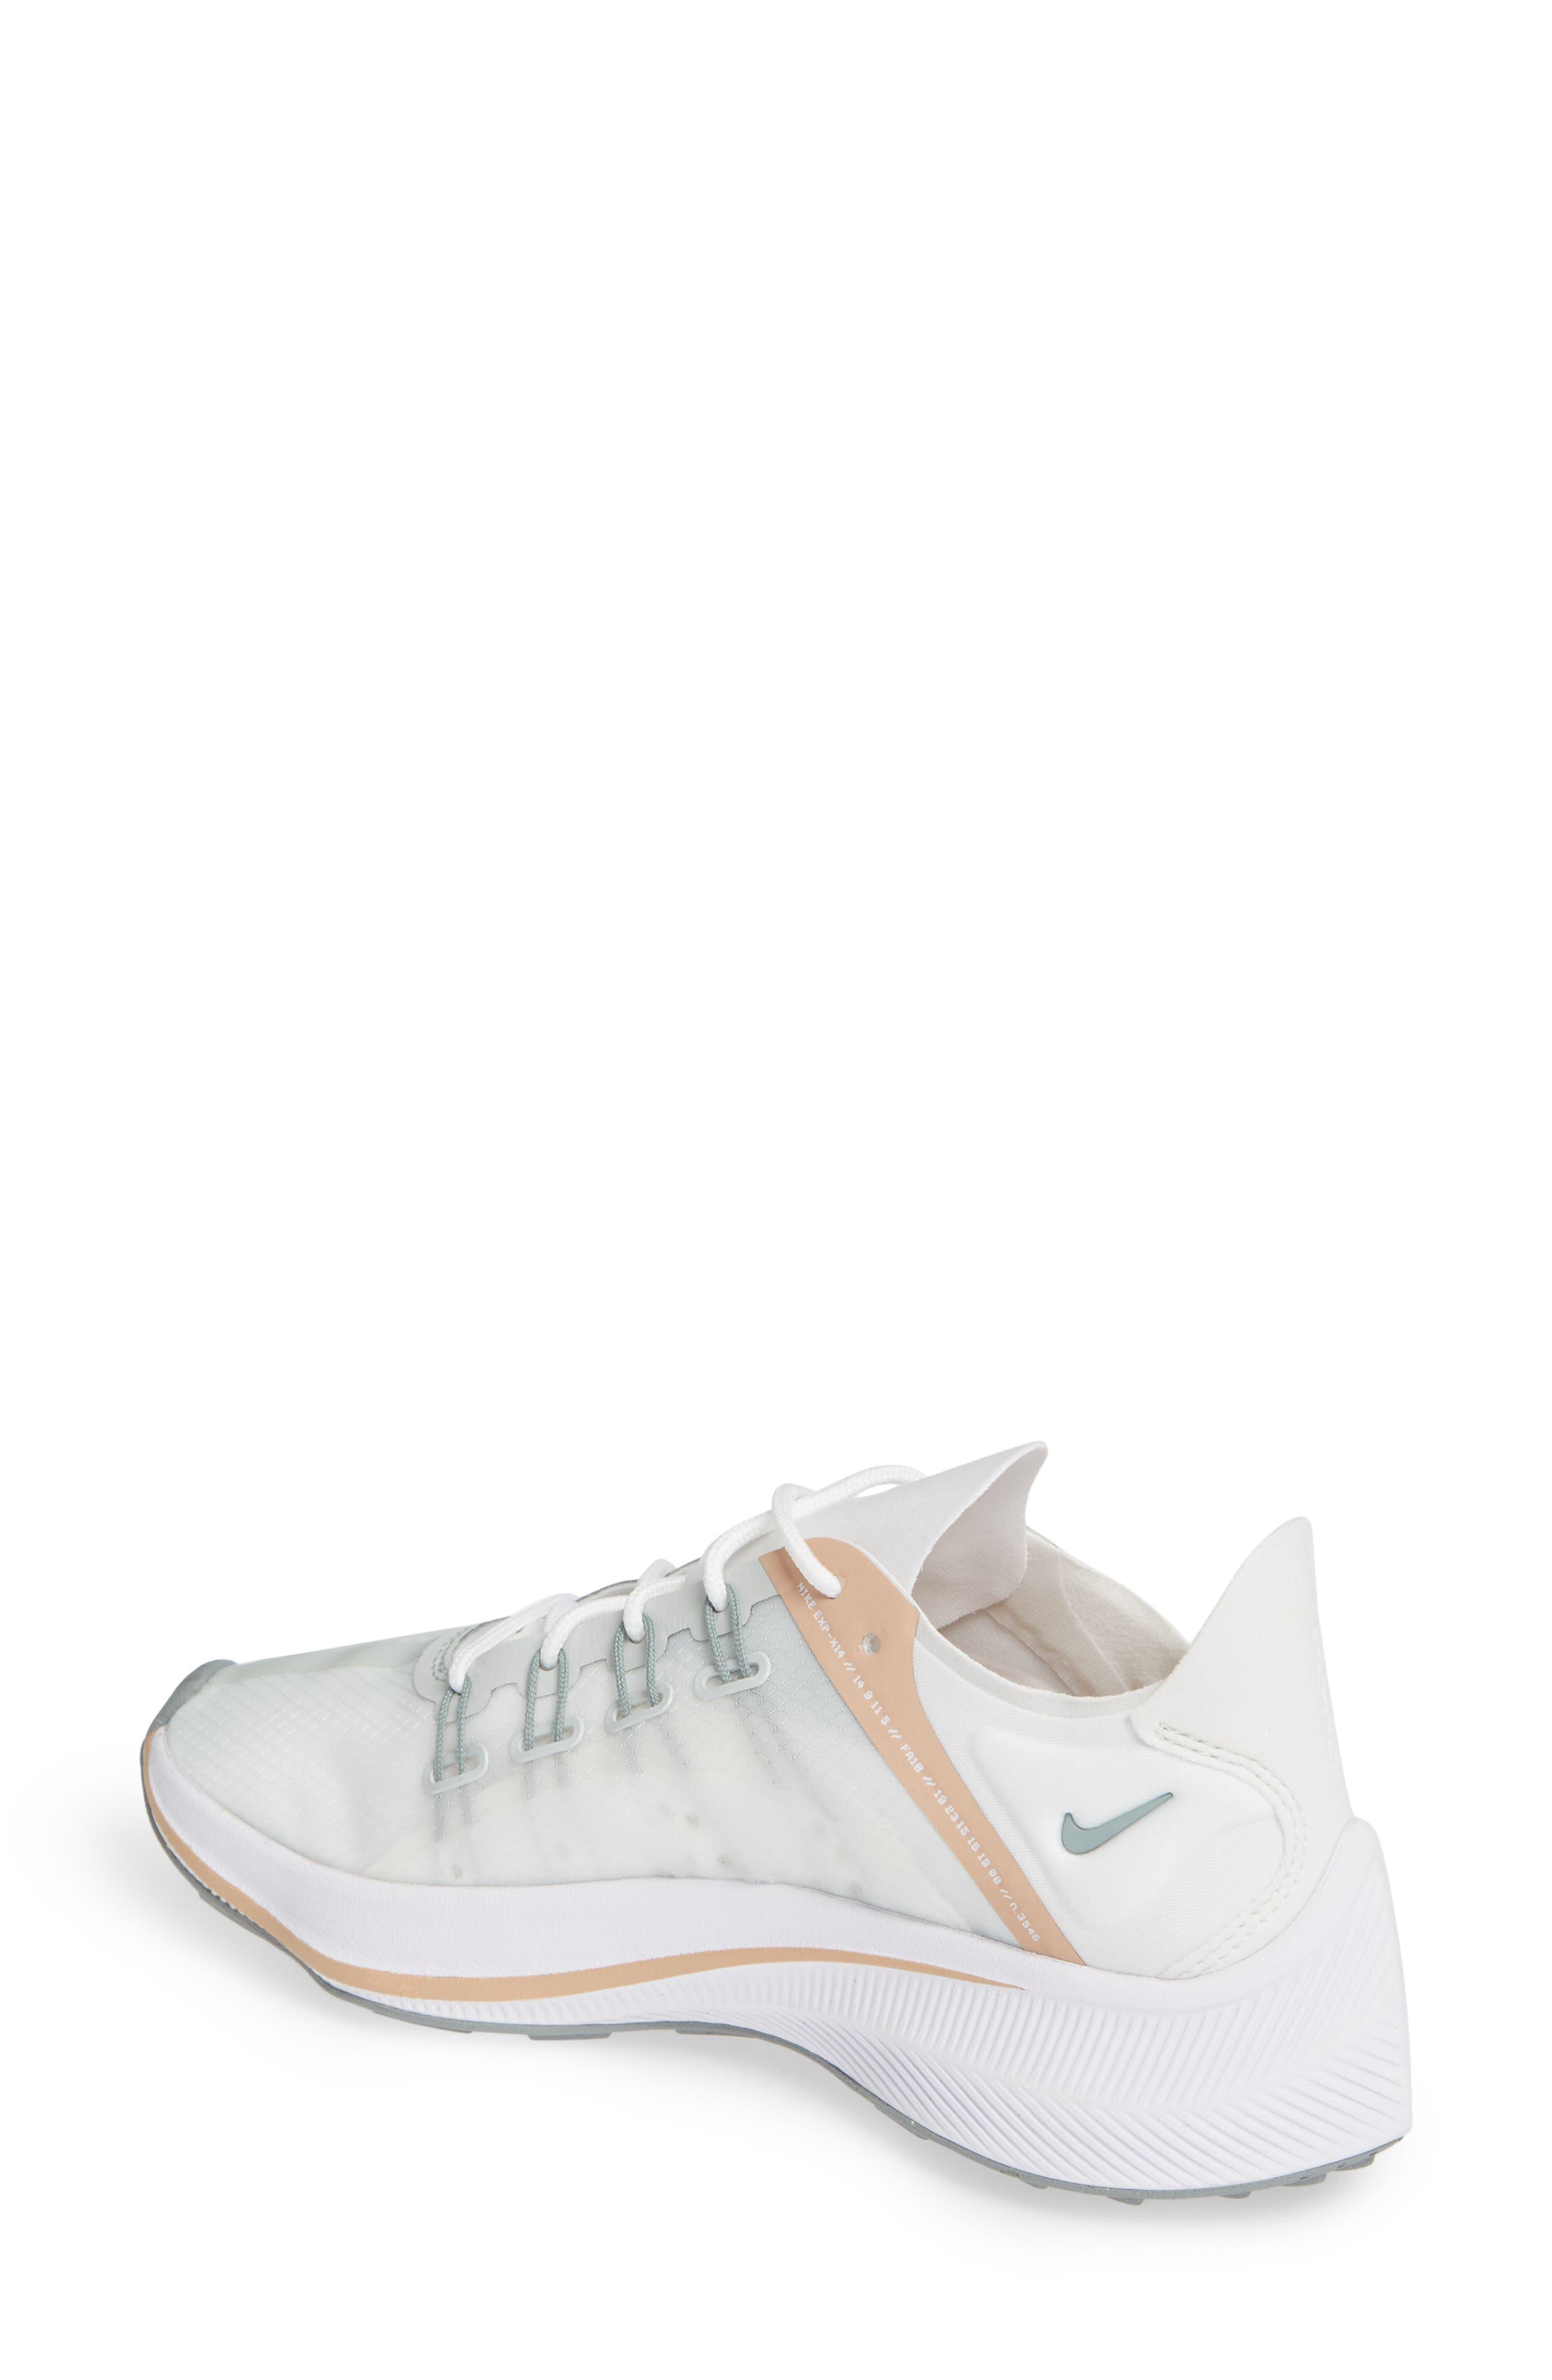 EXP-X14 Sneaker,                             Alternate thumbnail 2, color,                             SUMMIT WHITE/ LIGHT SILVER